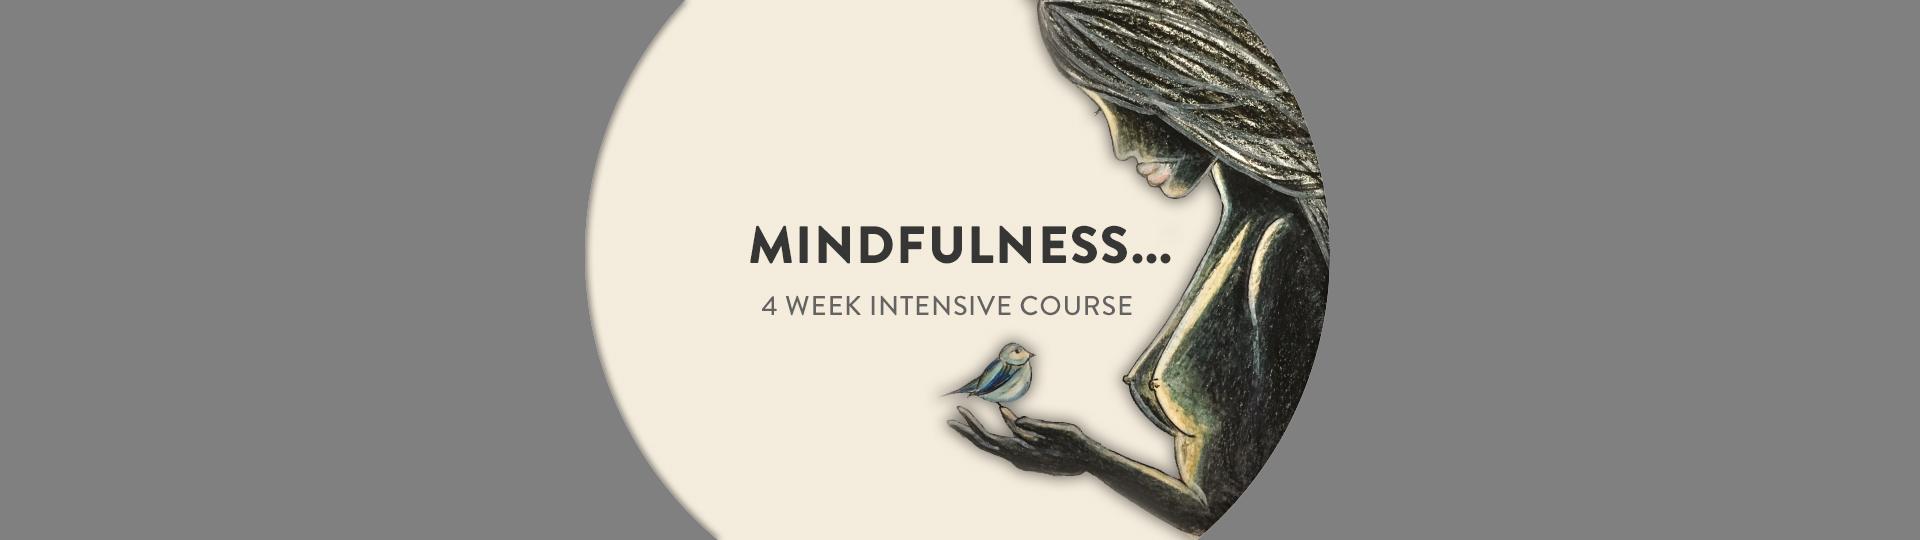 0539_KAYA_FEBRUARY_Mindfulness_Website-Slider